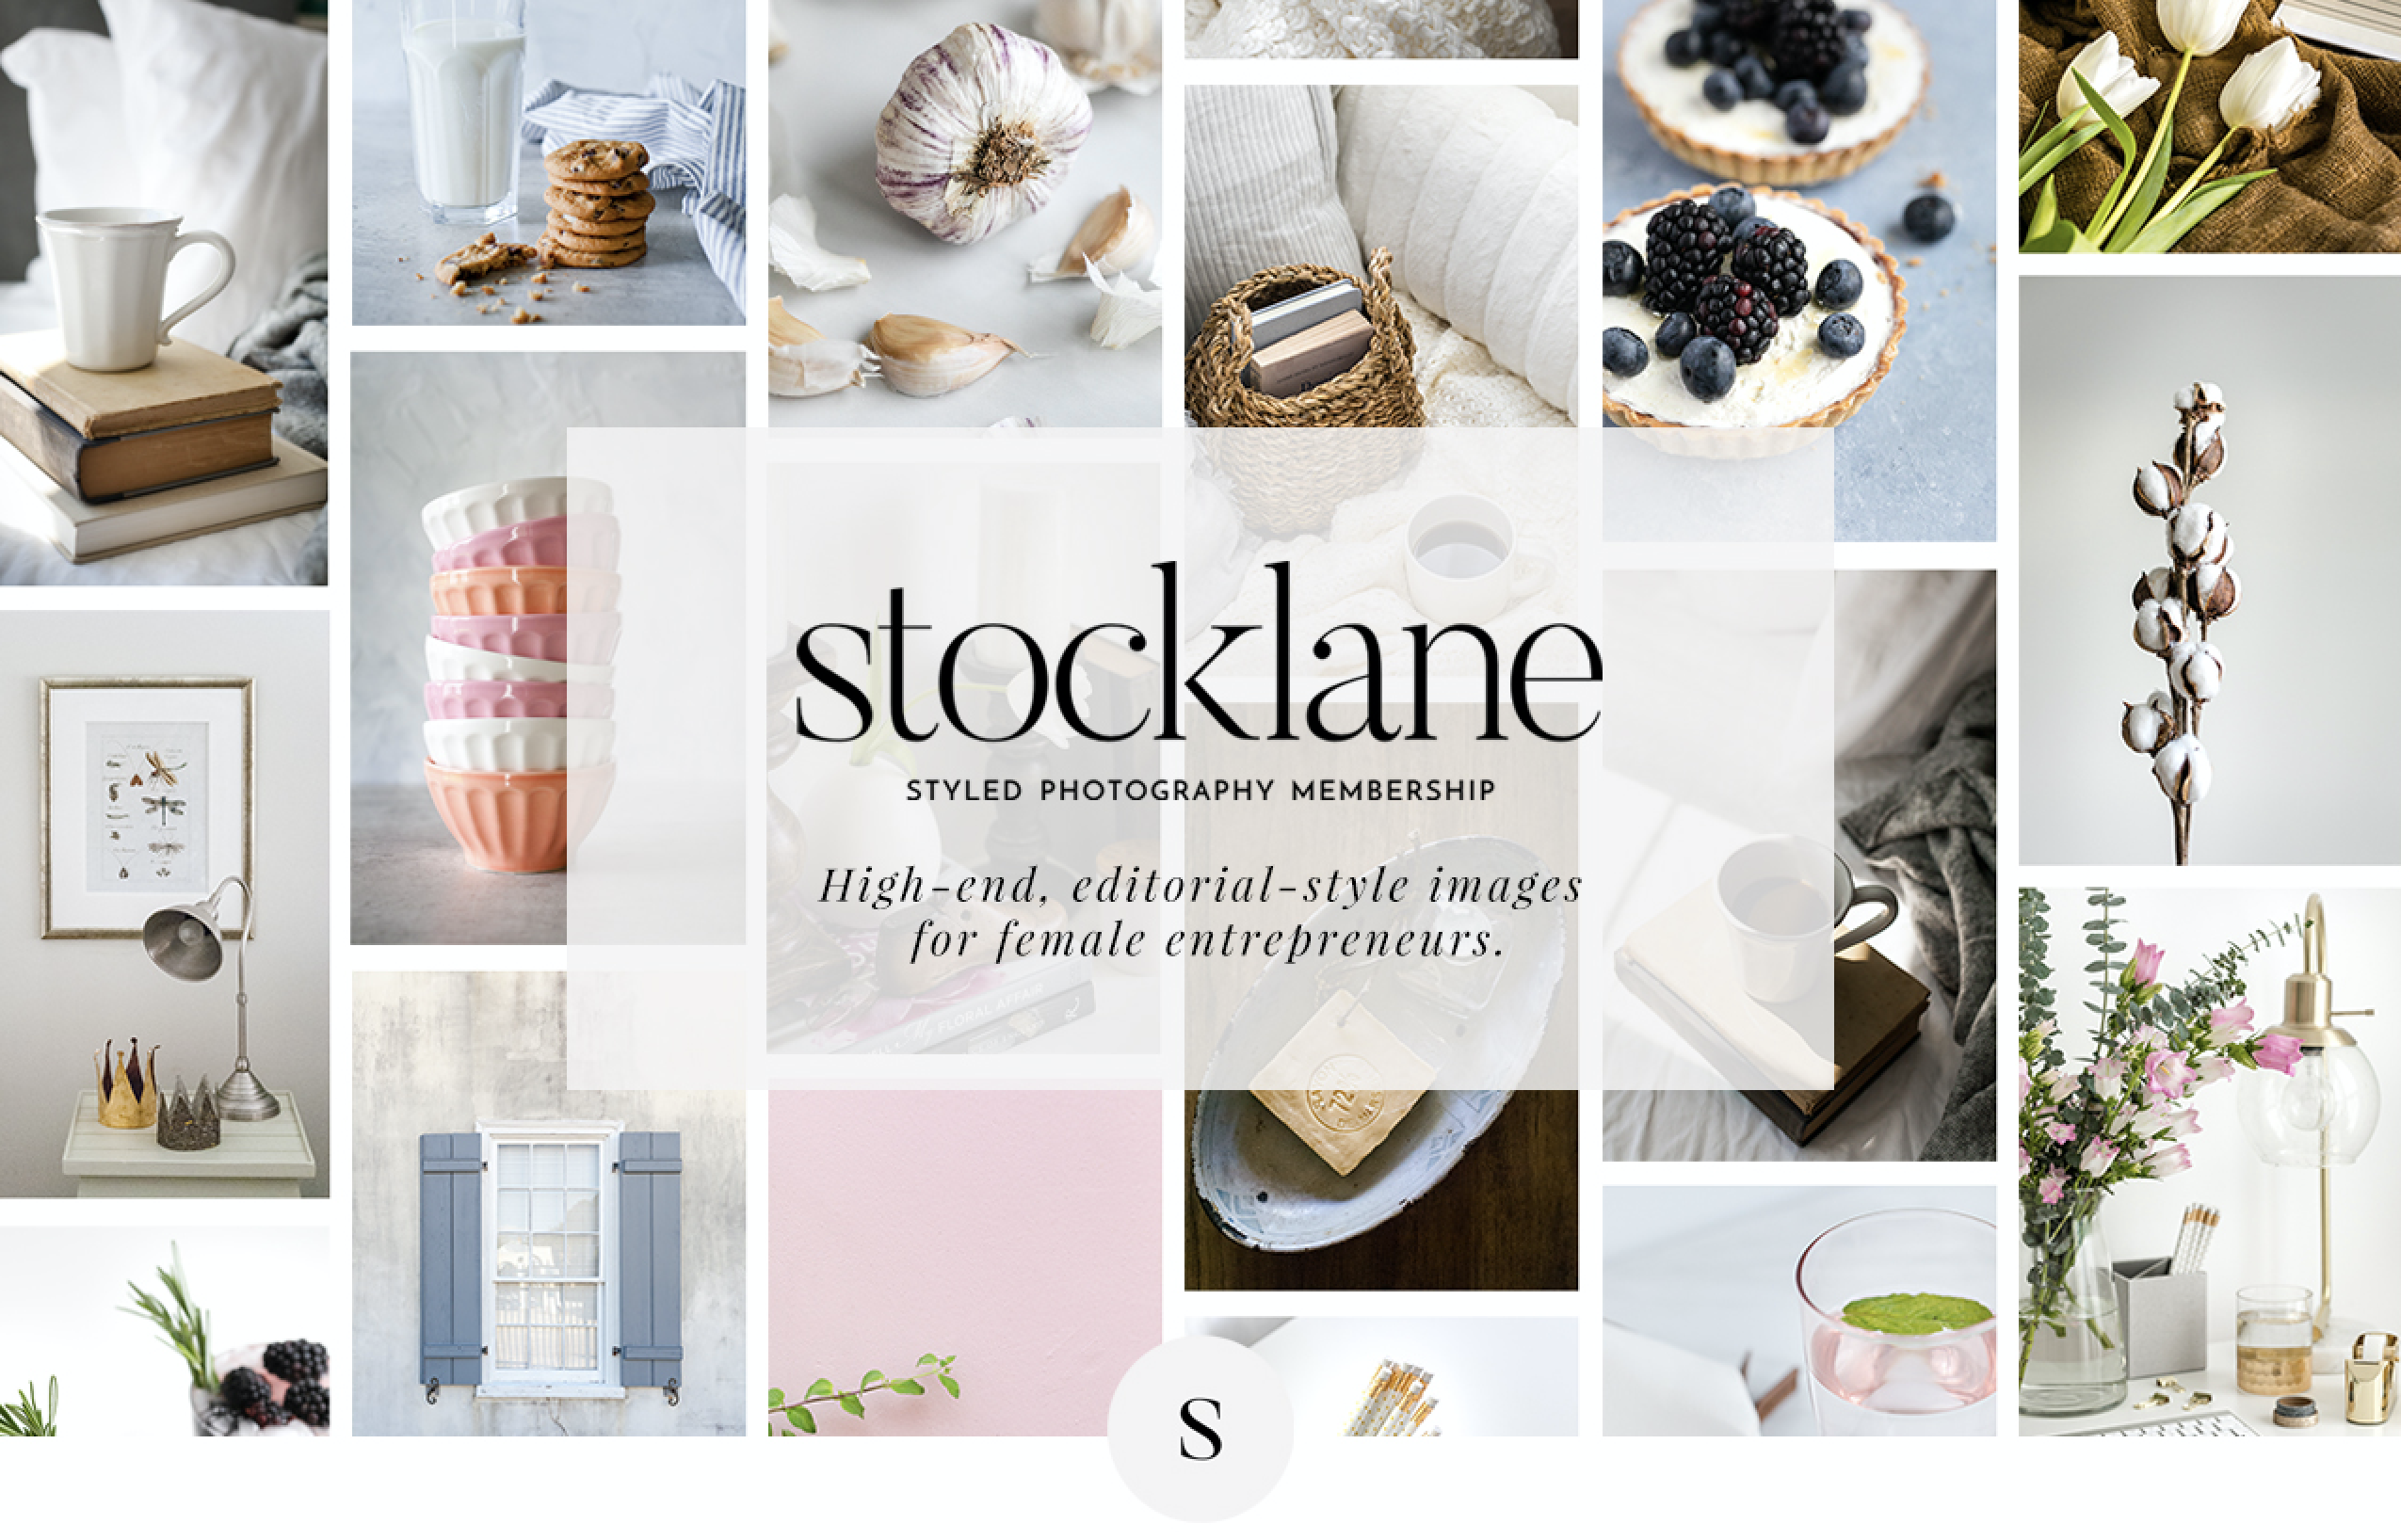 Styled Photography Membership for Female Entrepreneurs  Visit